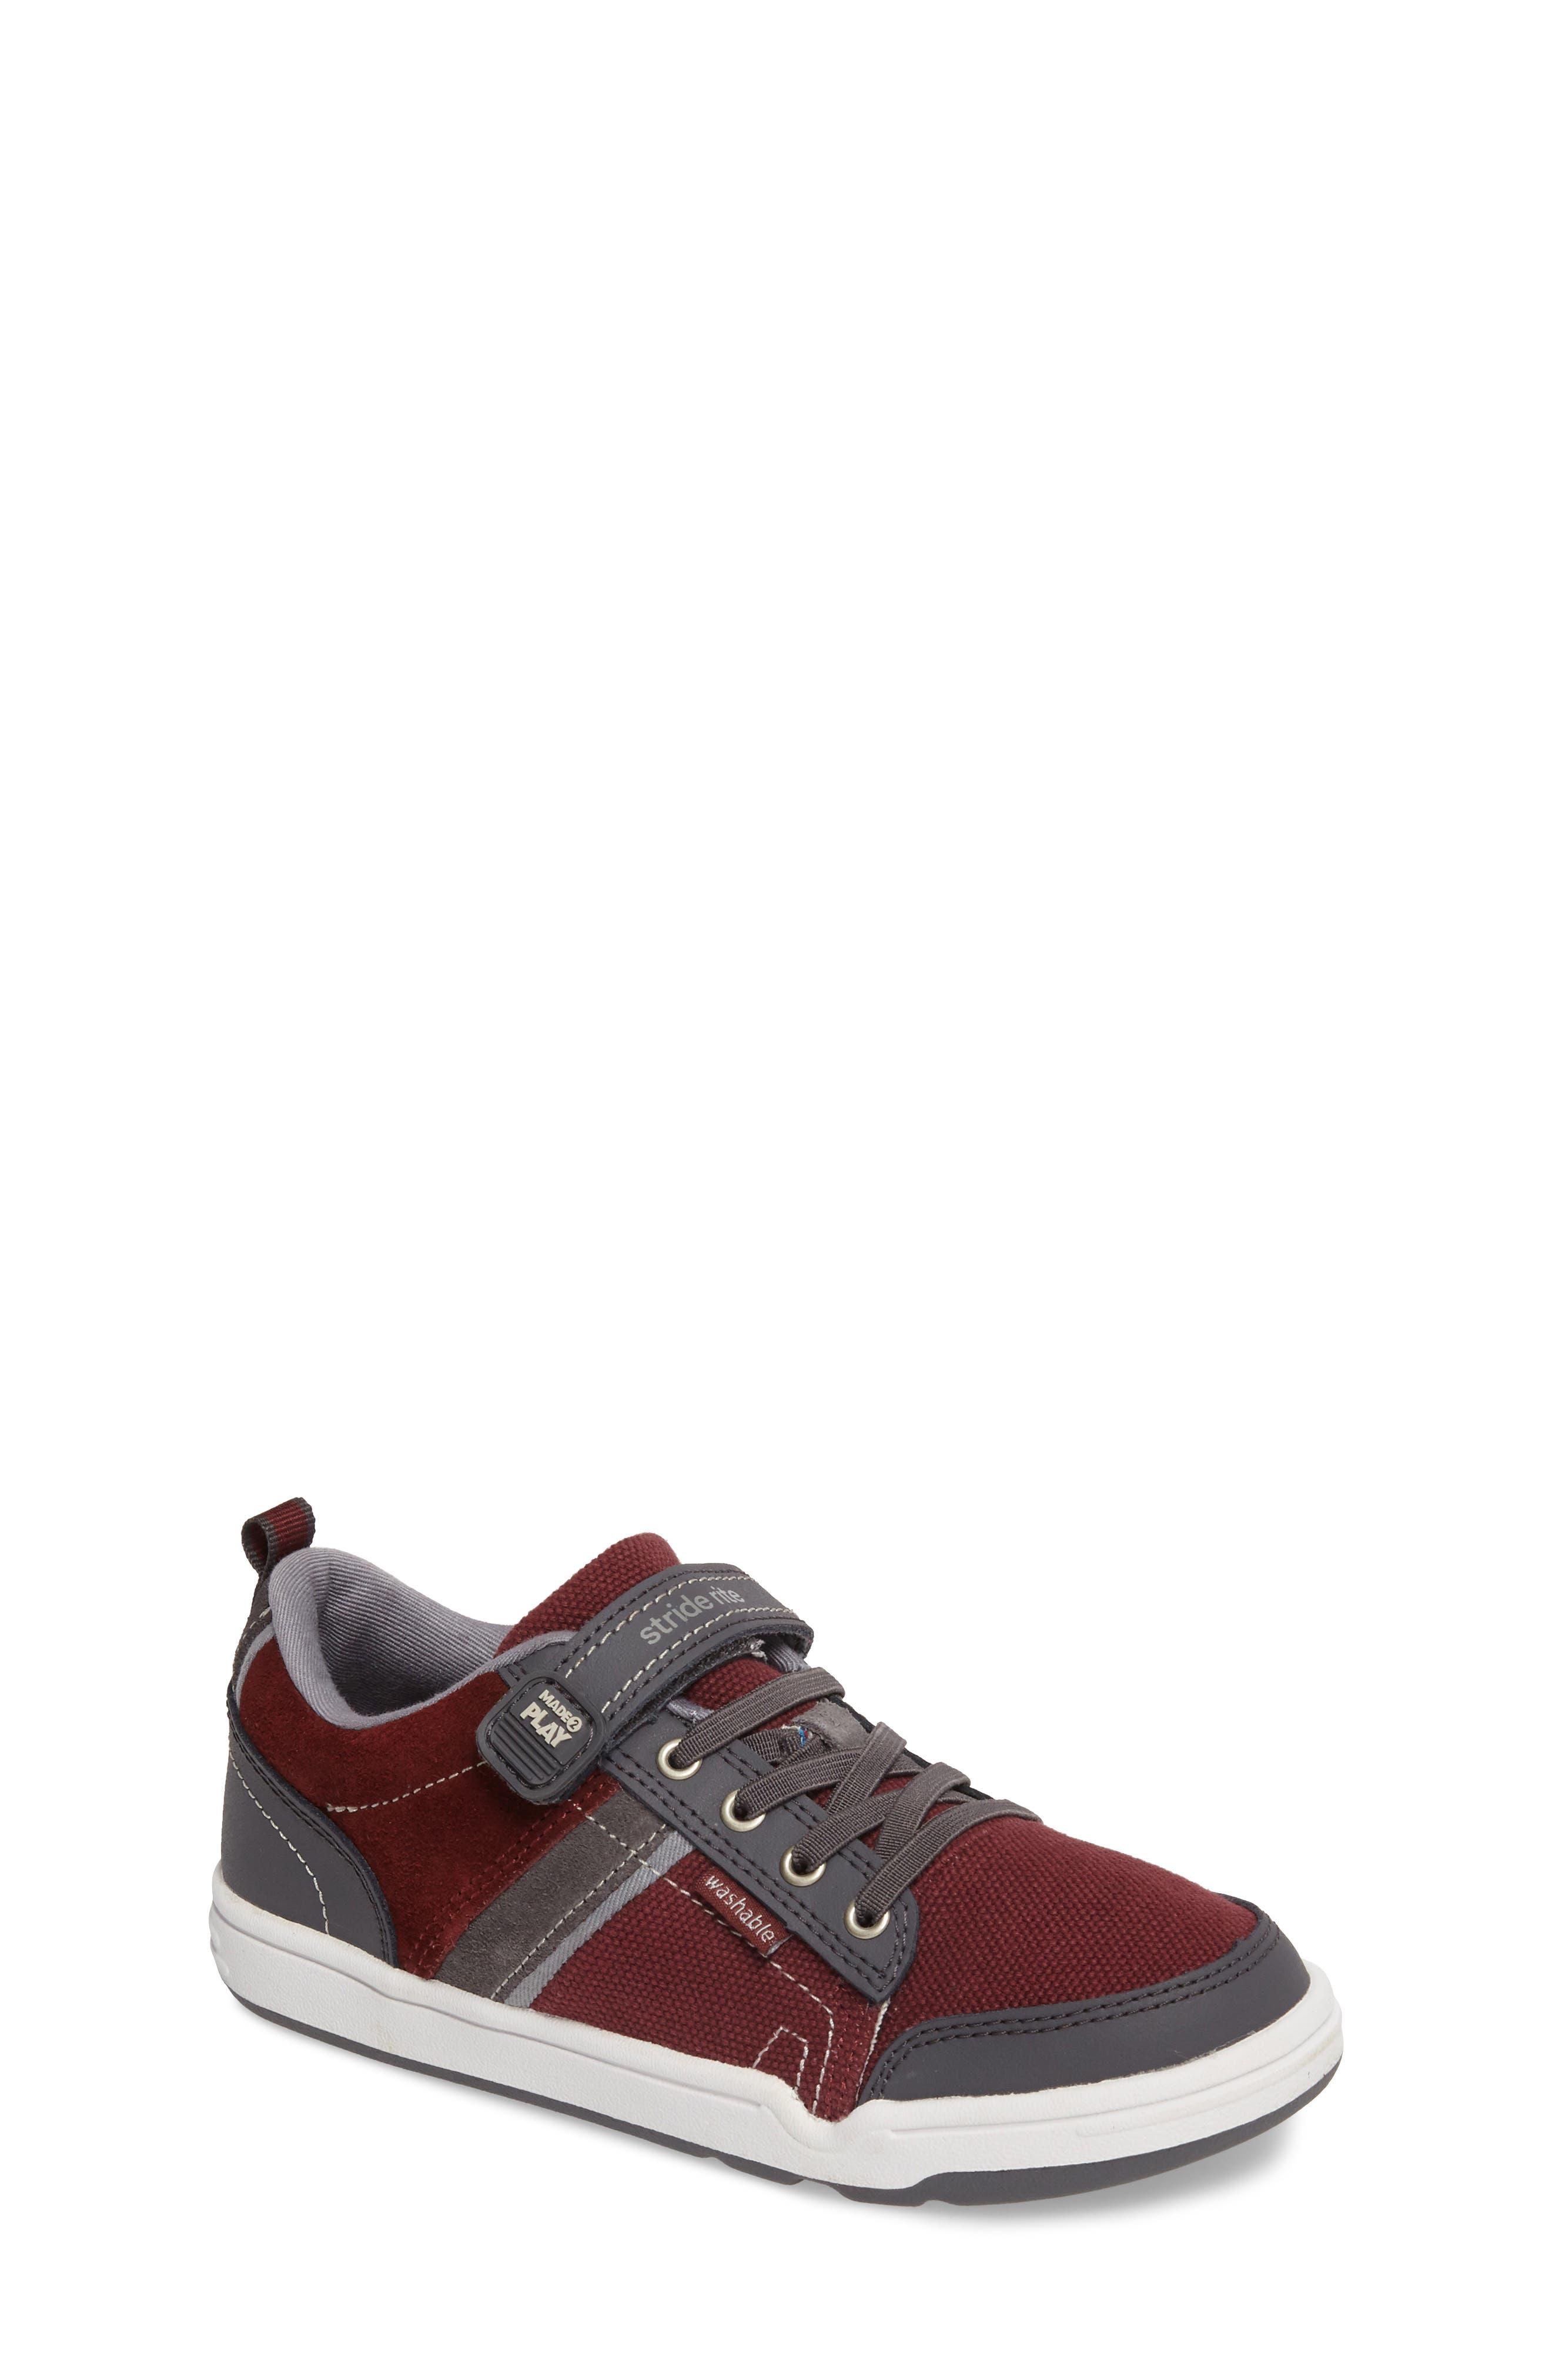 'Made 2 Play<sup>™</sup> - Kaleb' Sneaker,                         Main,                         color, 601